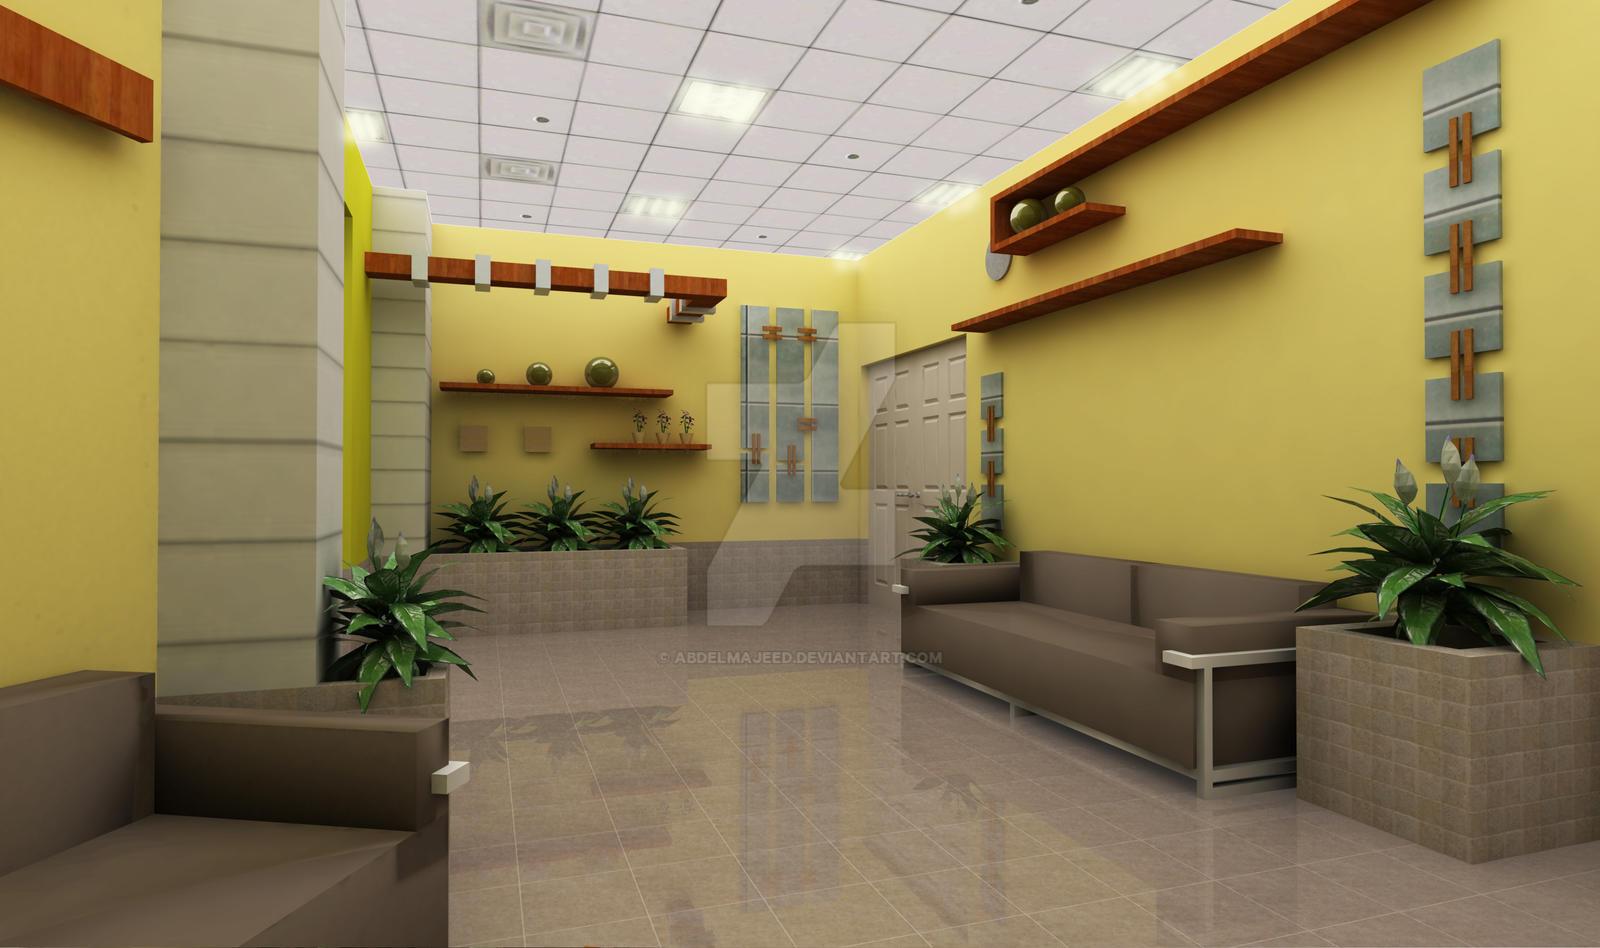 Waiting area interior design1 by abdelmajeed on deviantart for Interior decorators in my area